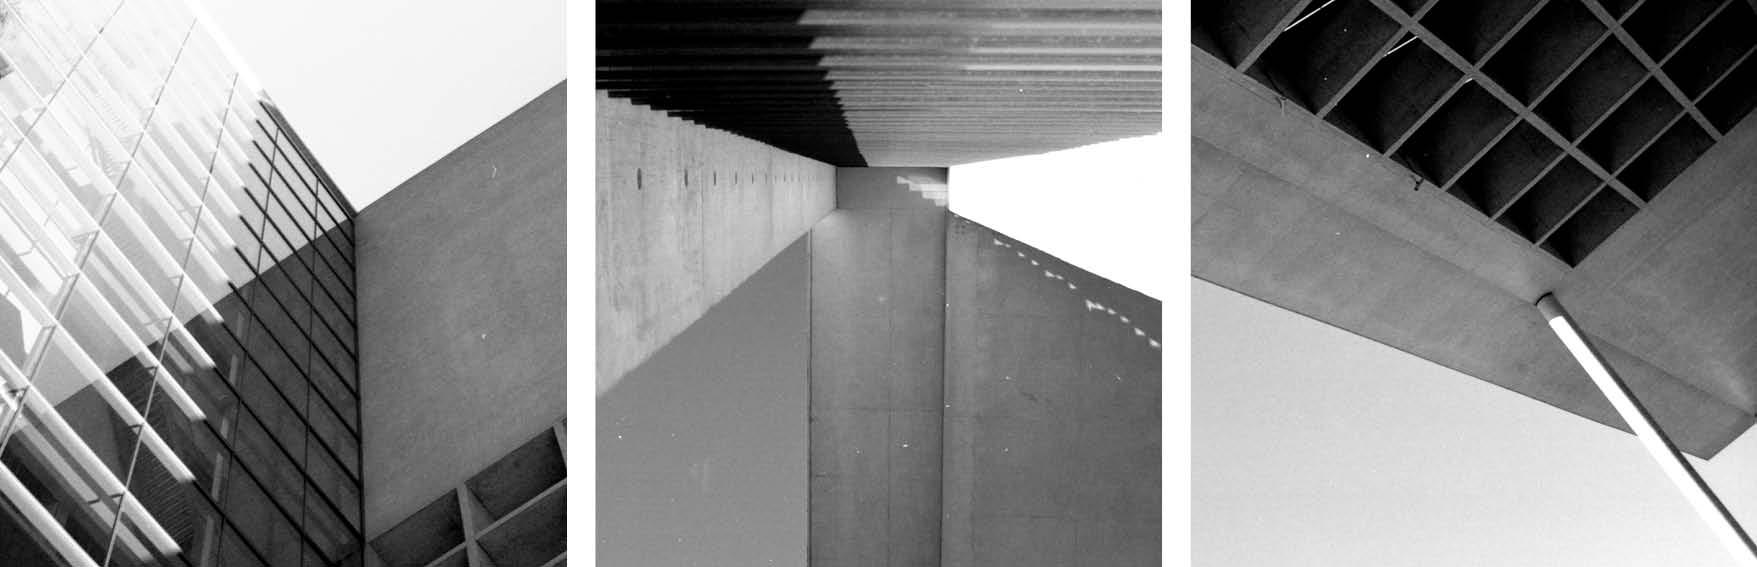 Ohne Titel – Roman Pretot, Serien-Nr.: 361-025